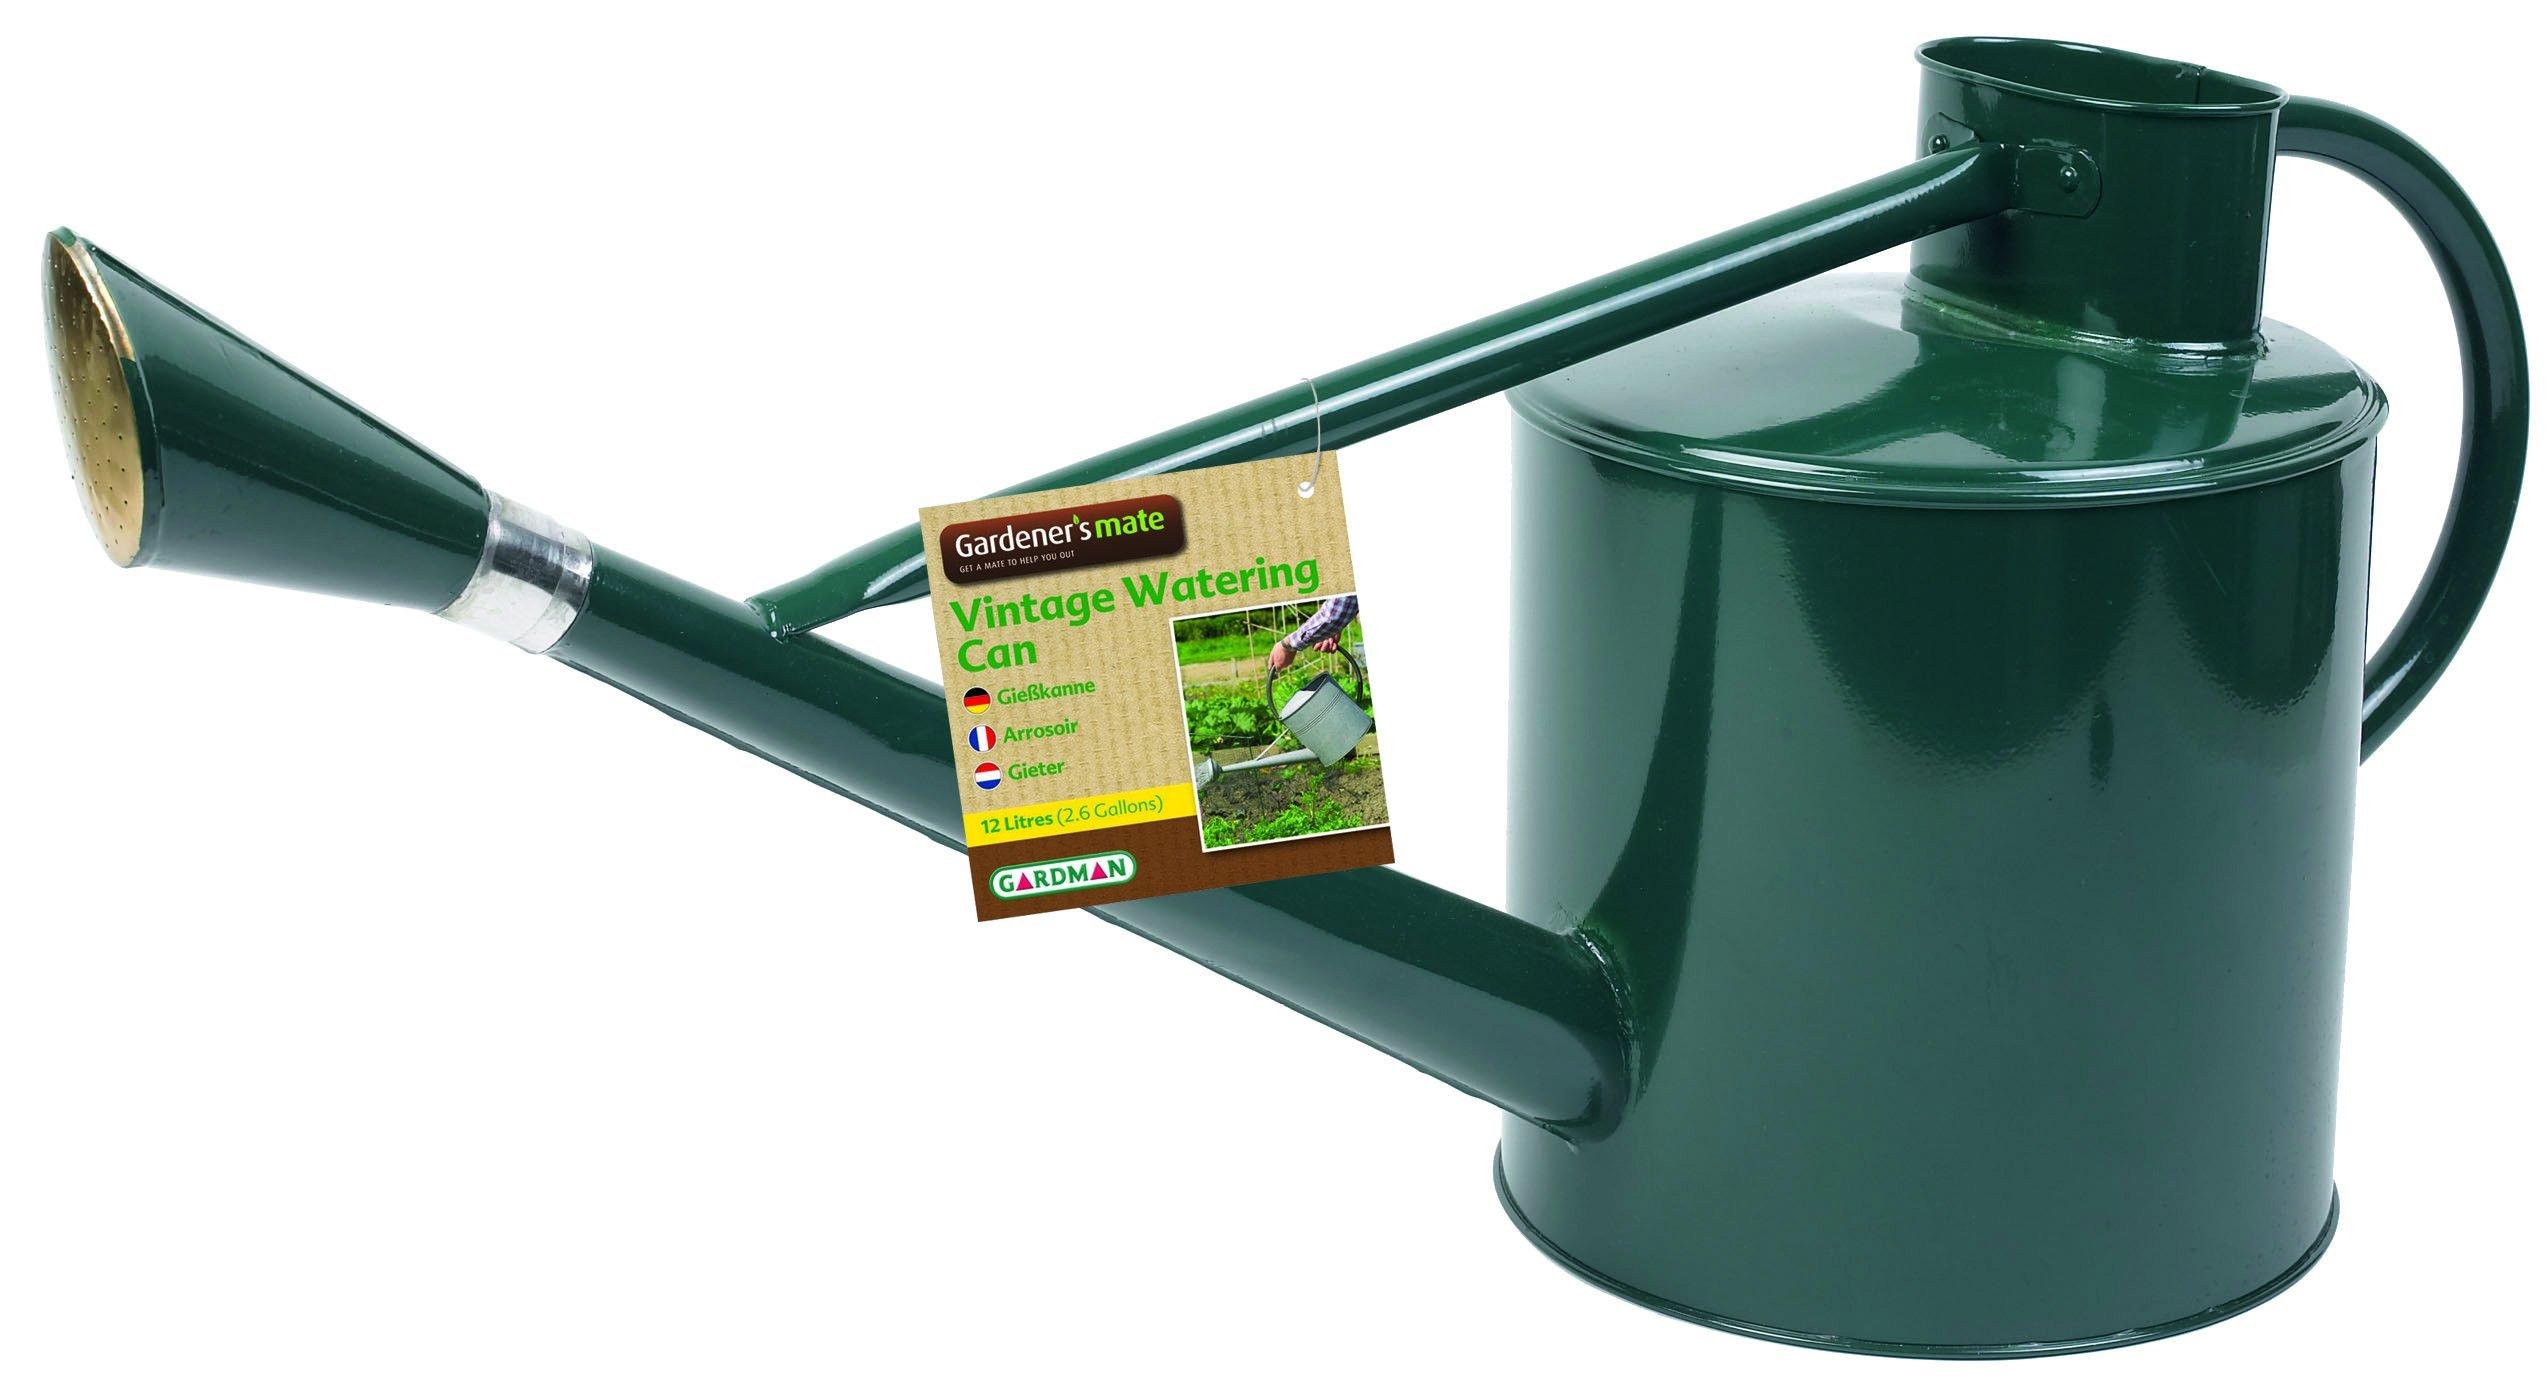 Gardman 8345 Long Reach Galvanized Steel Watering Can, 2-Gallon, Green by Gardman